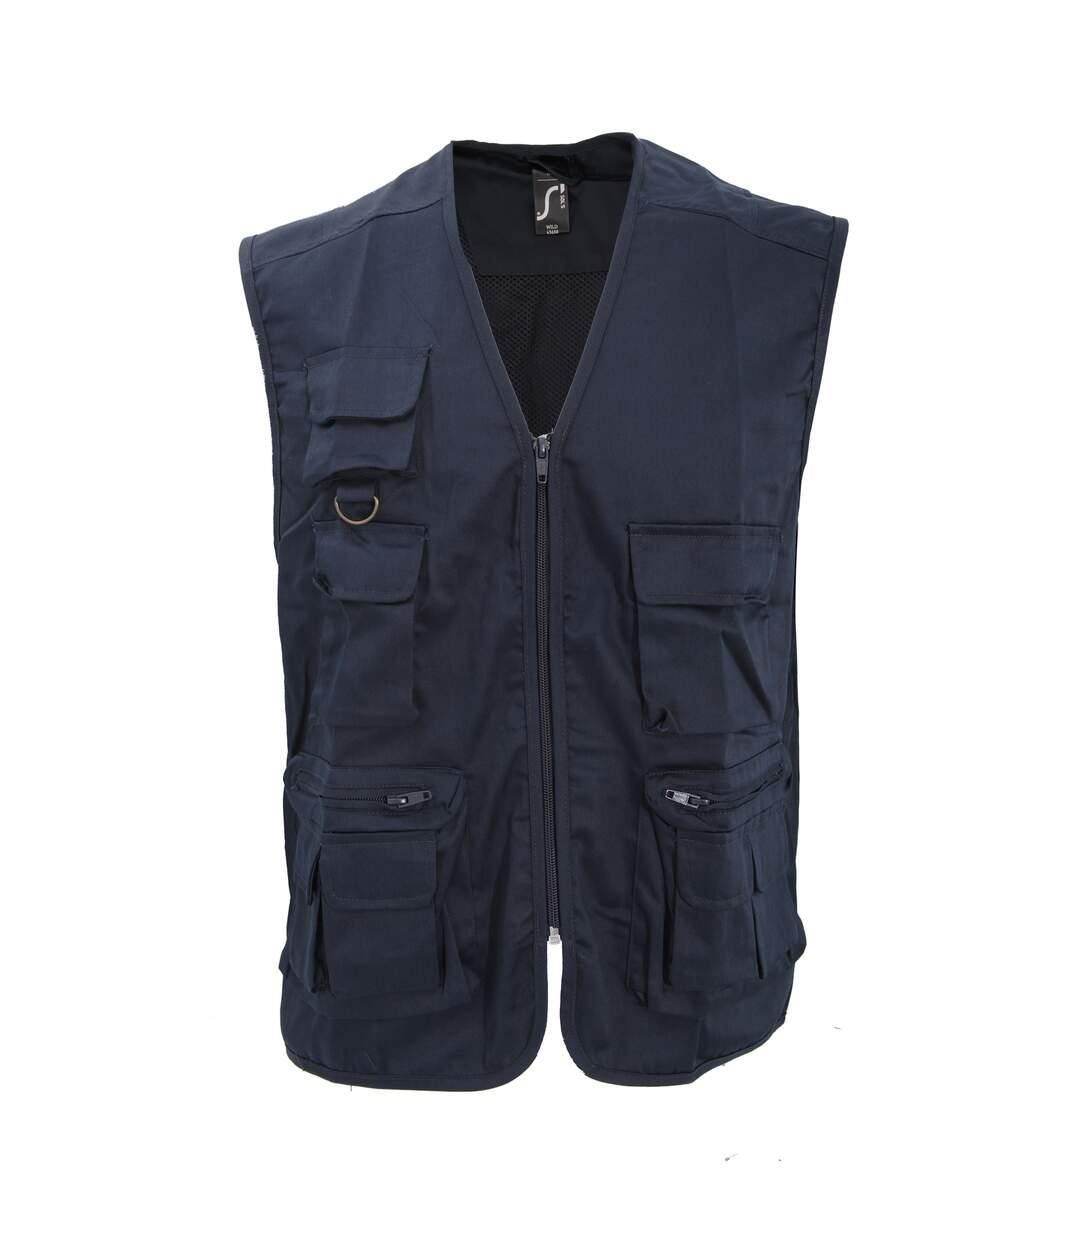 SOLS Wild Unisex Full Zip Waistcoat Bodywarmer Jacket (Navy) - UTPC354